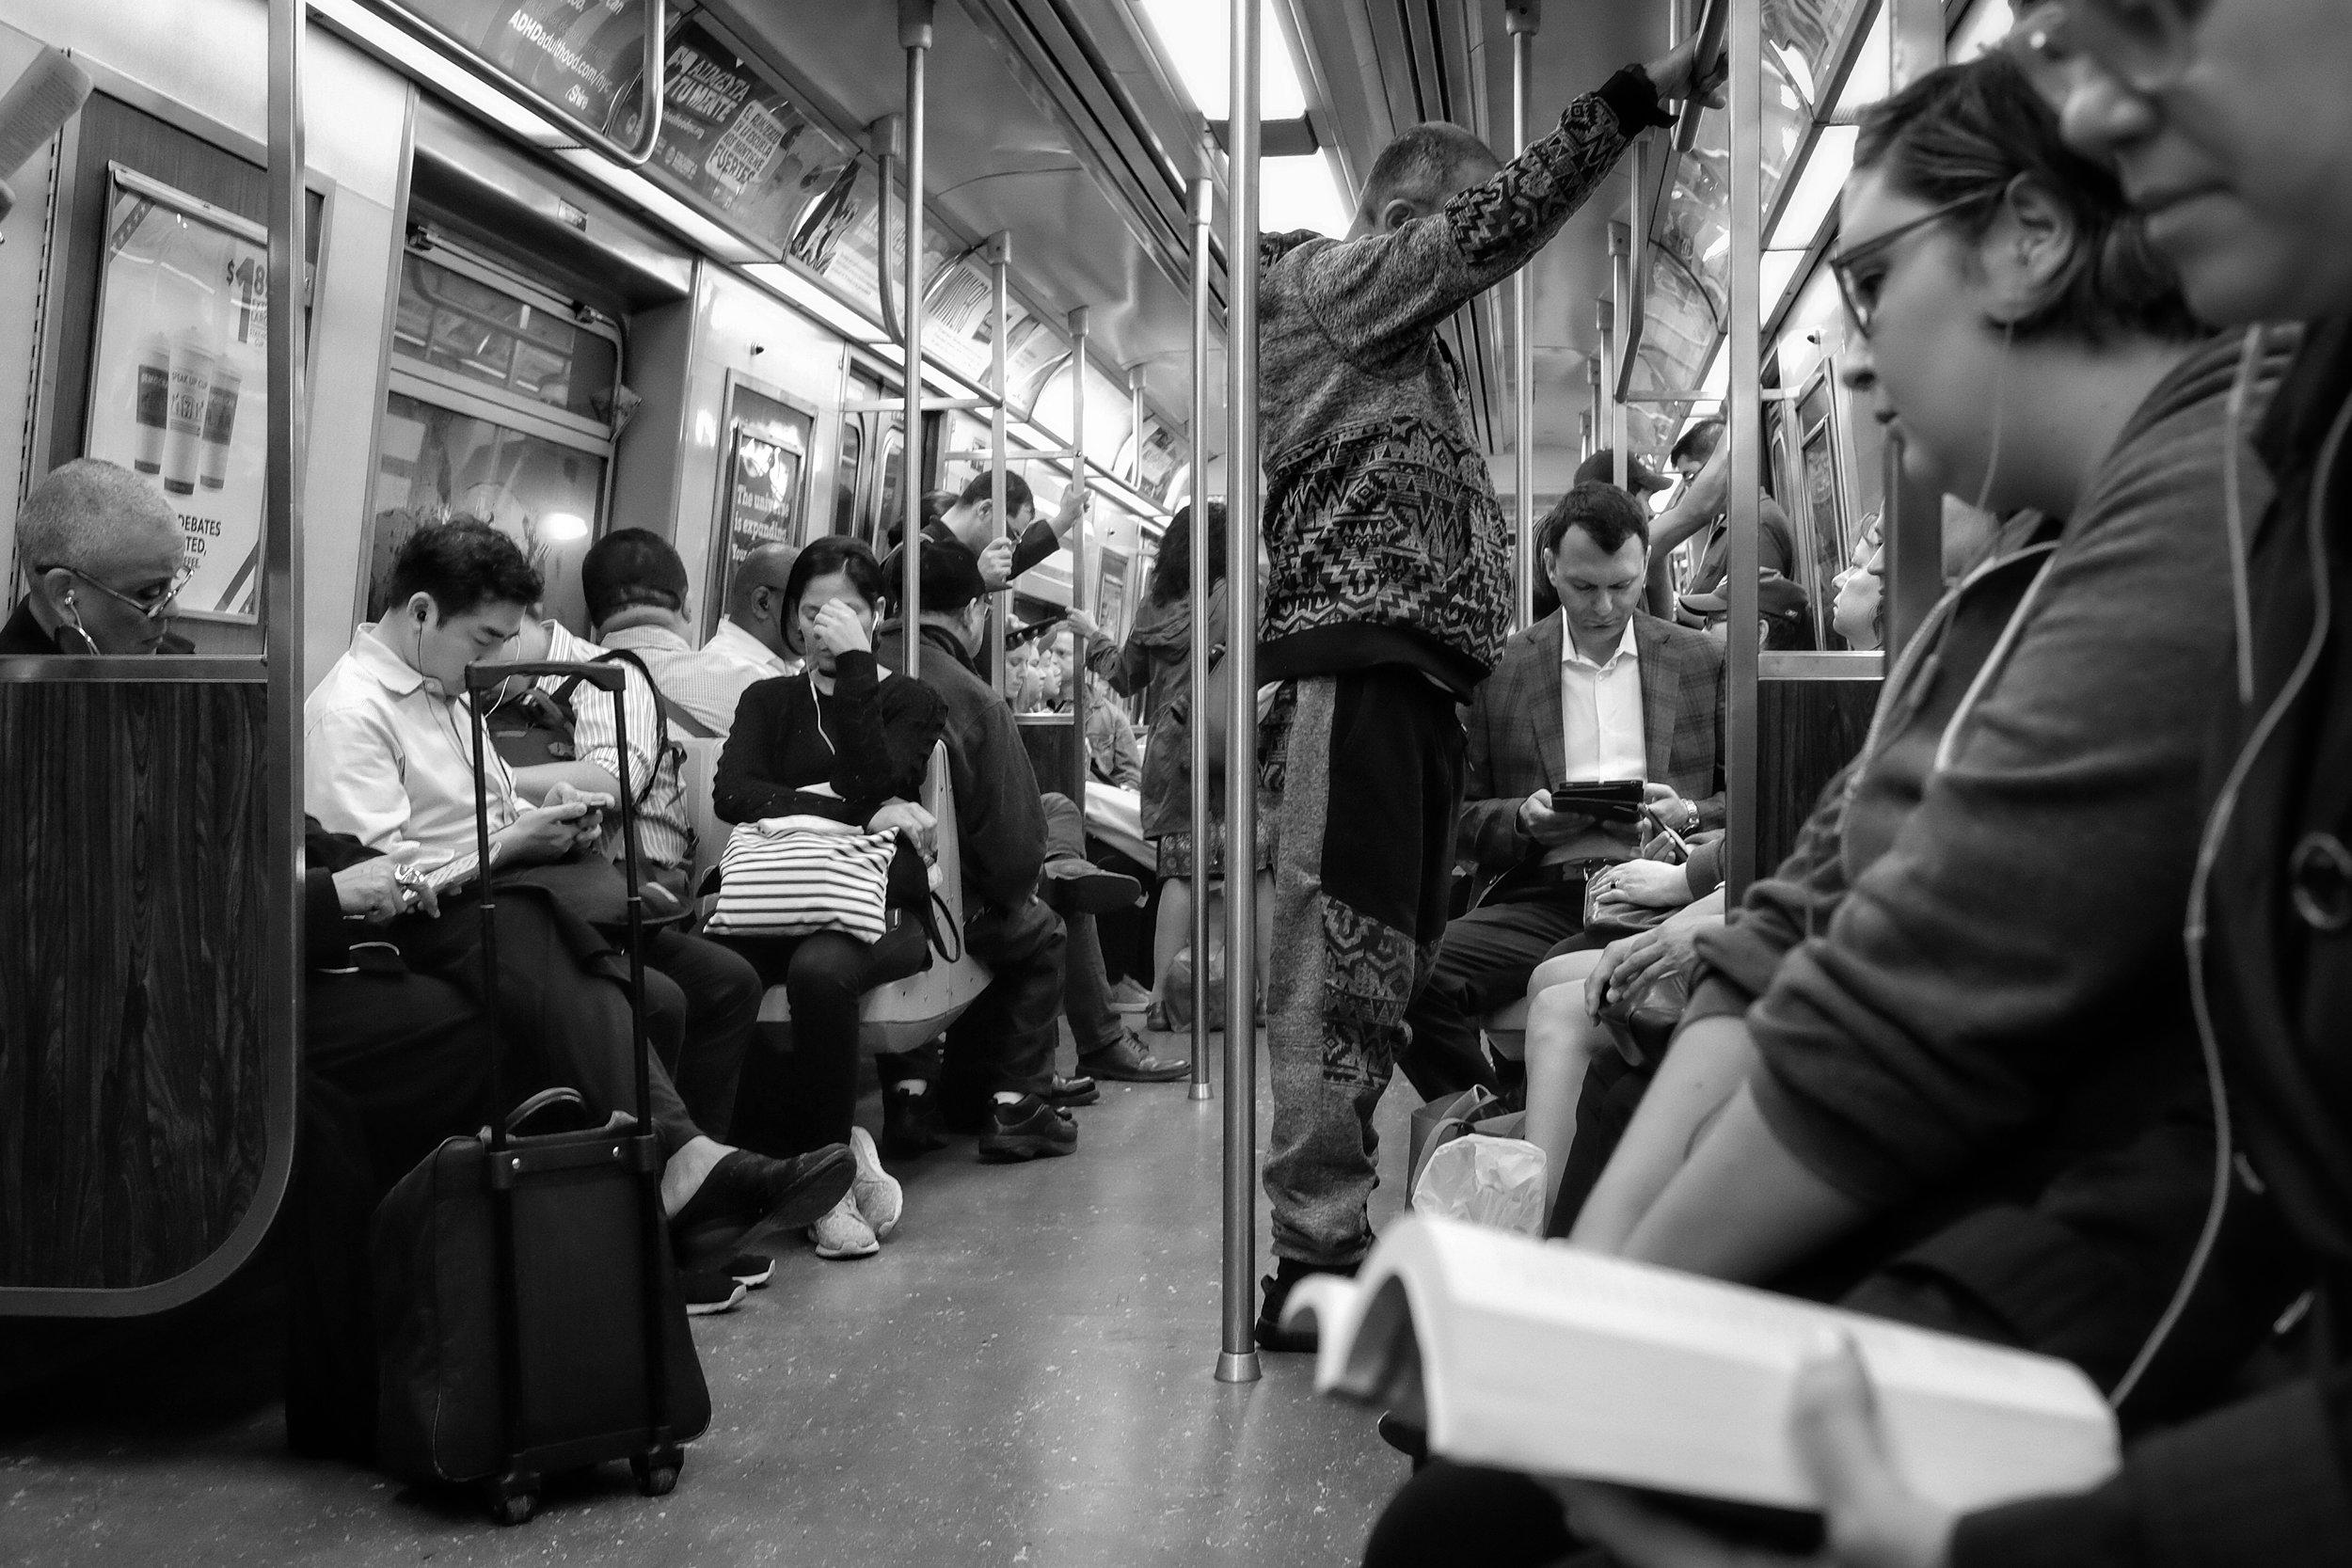 N Train. 8th Street to Canal Street. New York City. 2016.